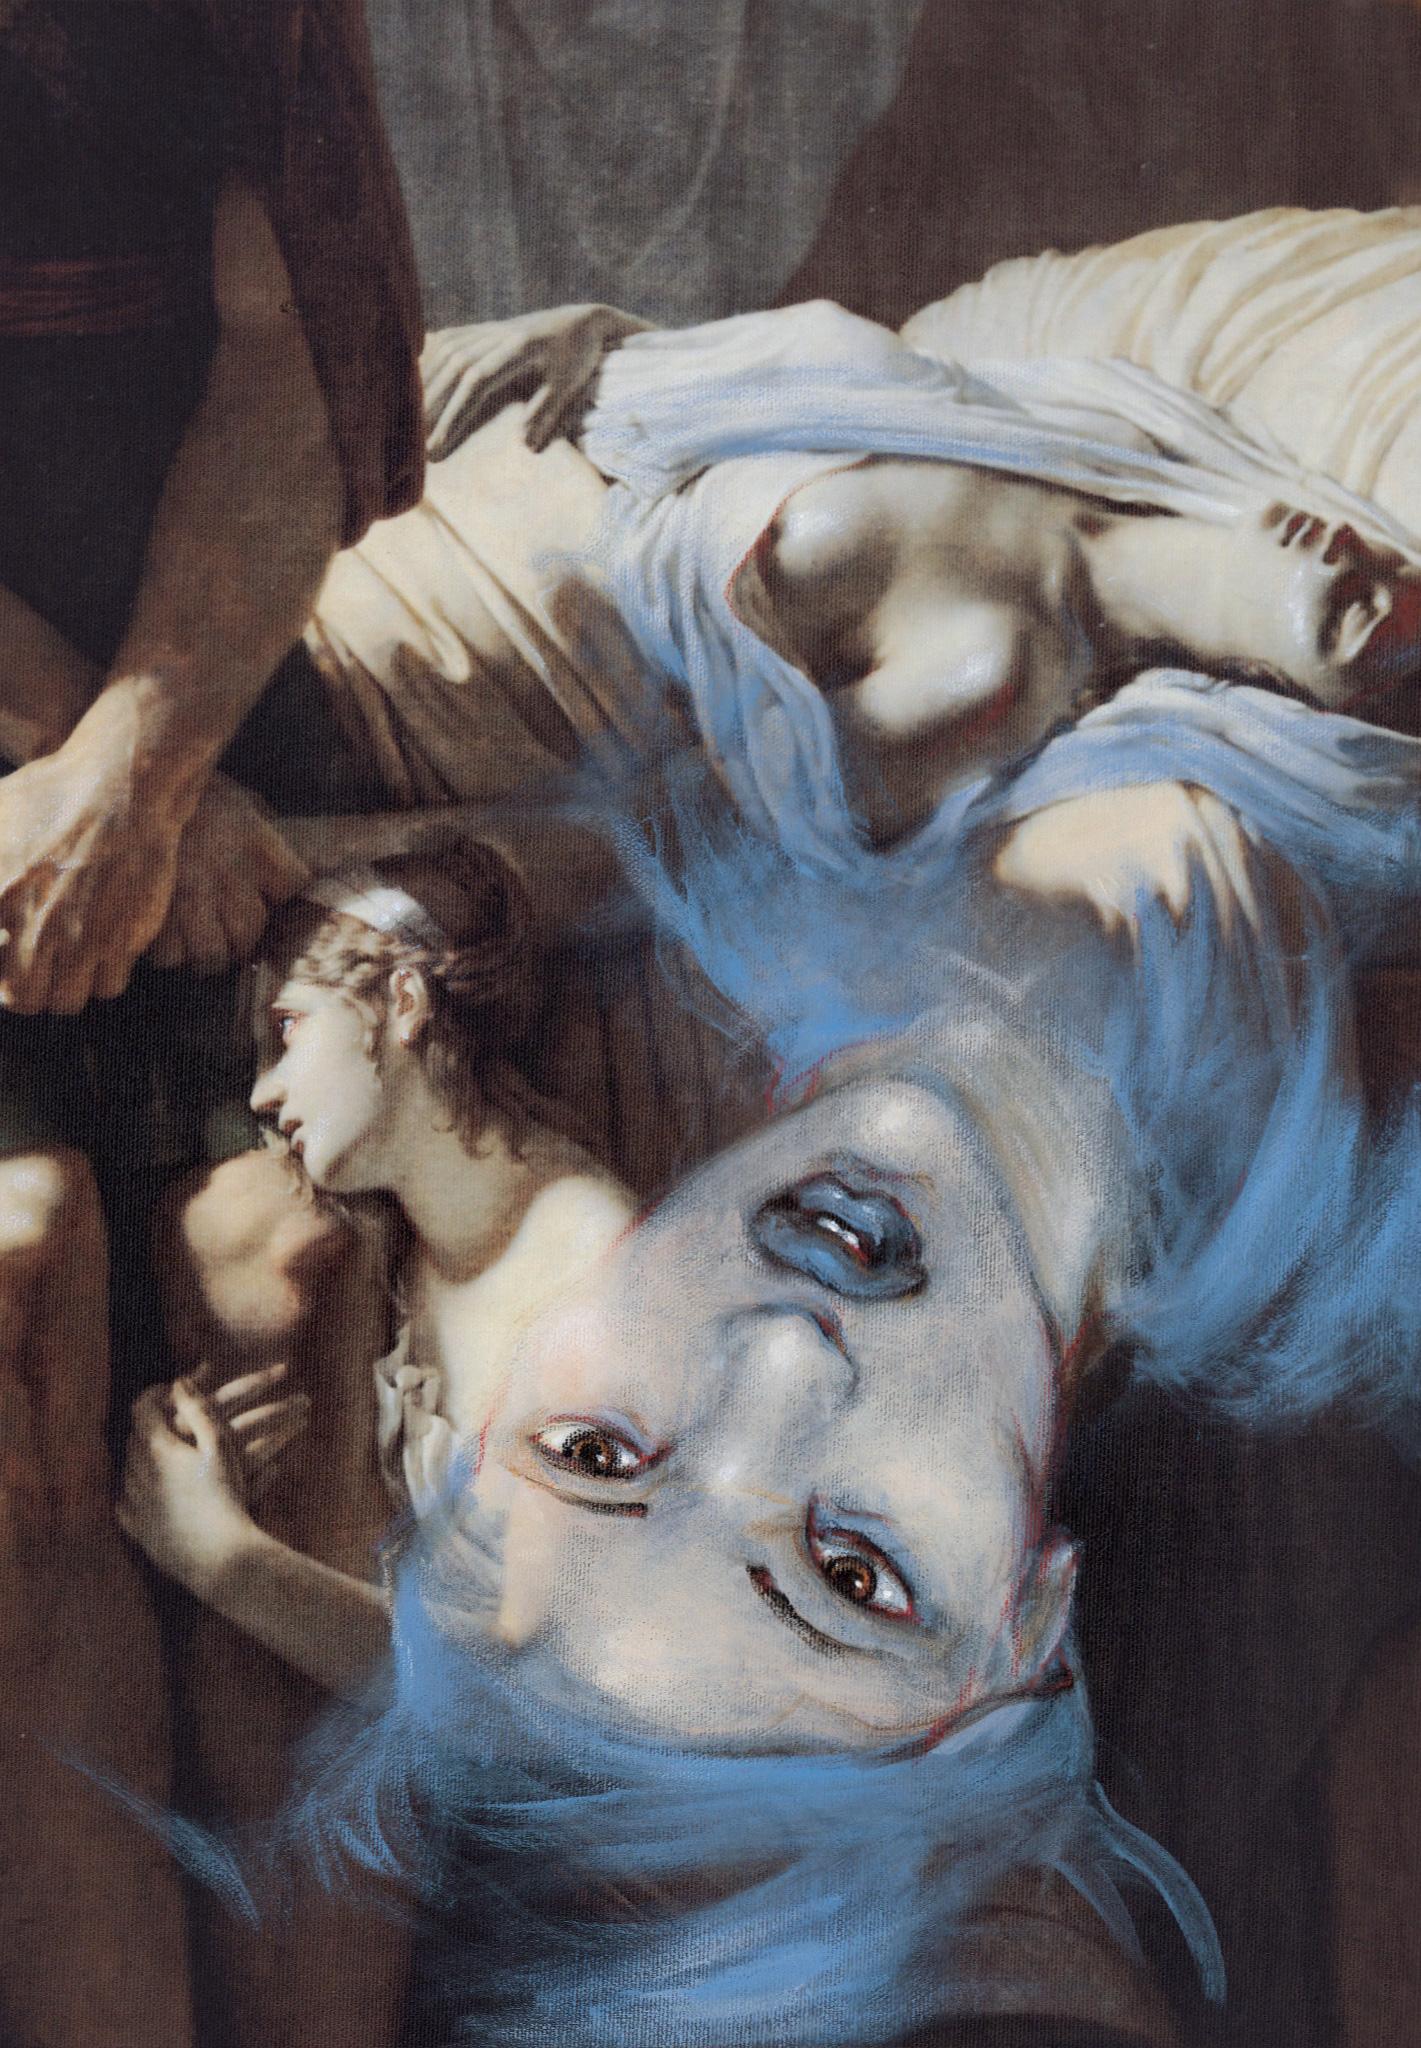 Bilal-fantomes-louvre-04.jpg